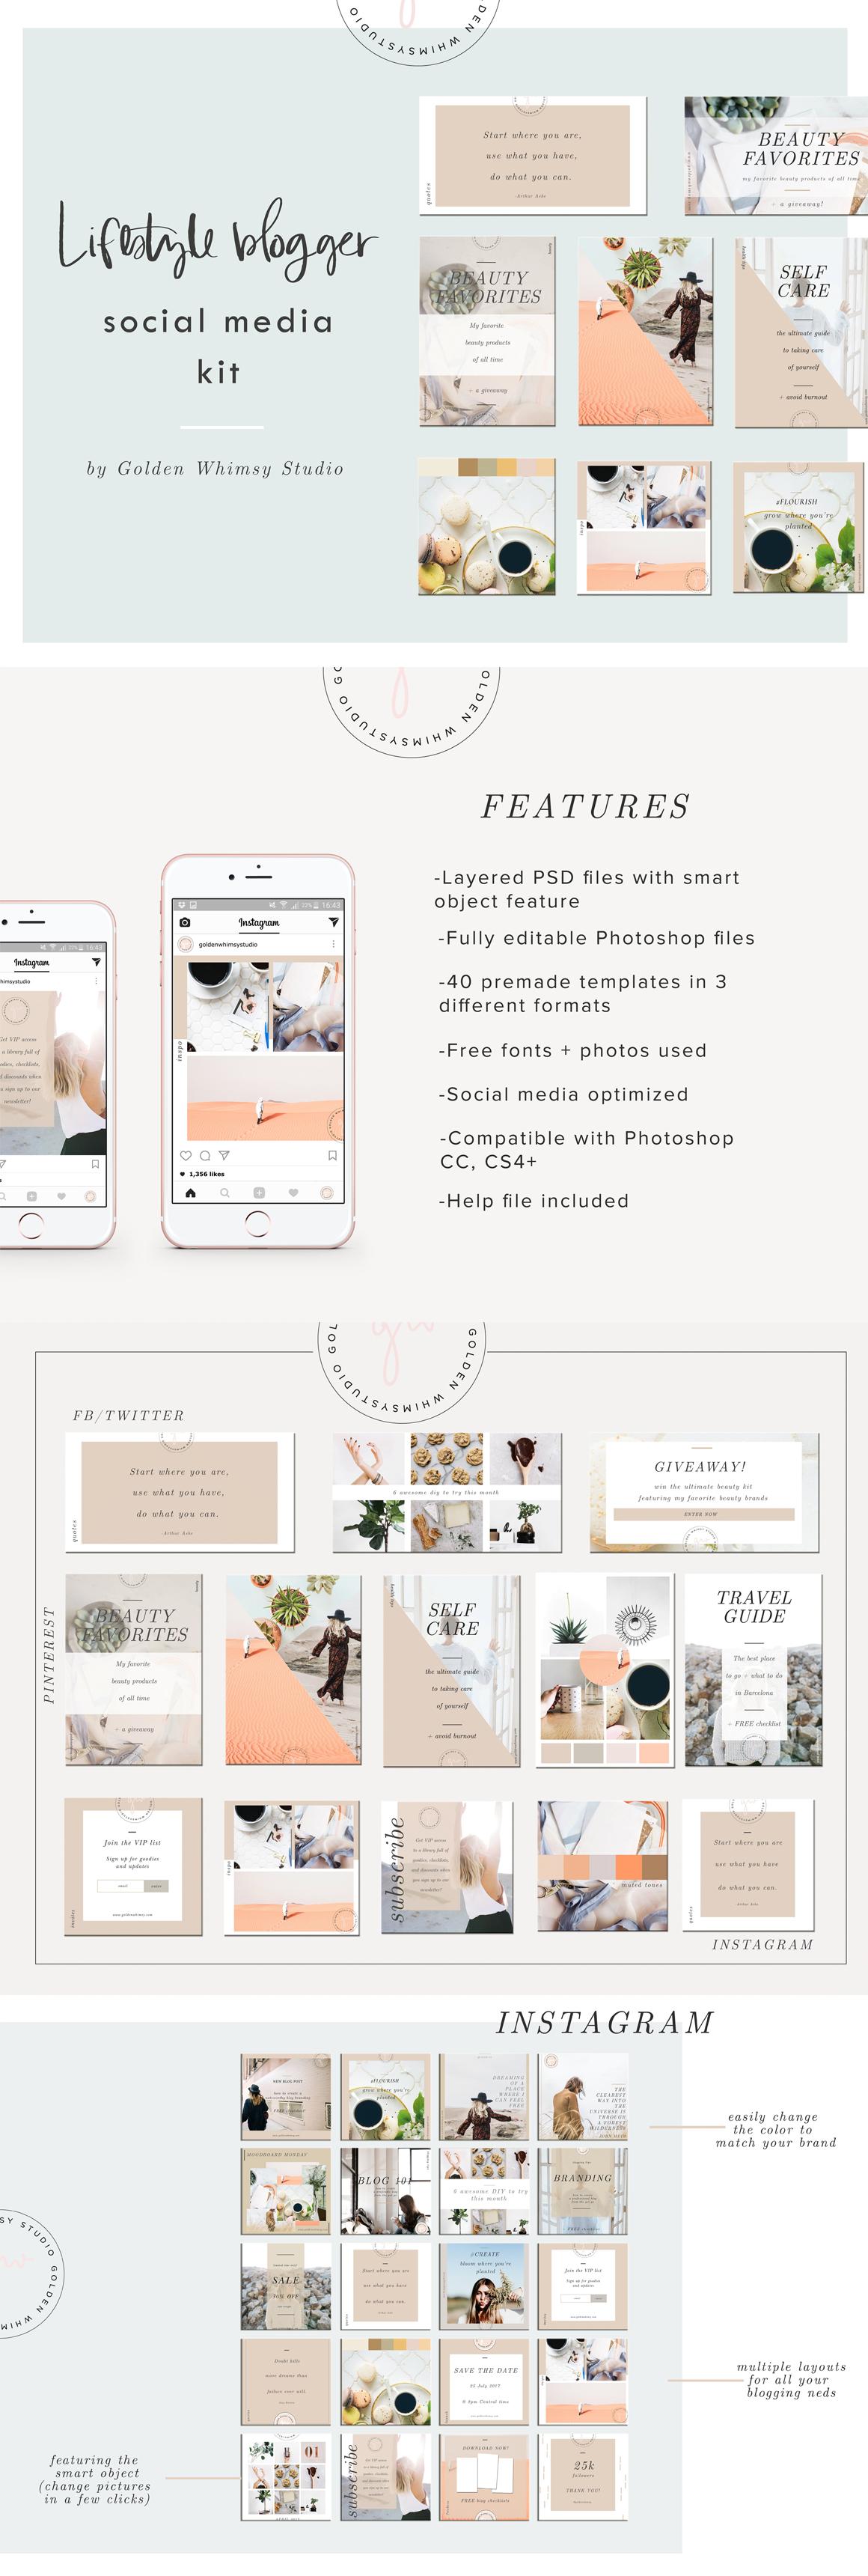 Lifestyle Blogger Social Media Kit Template PSD